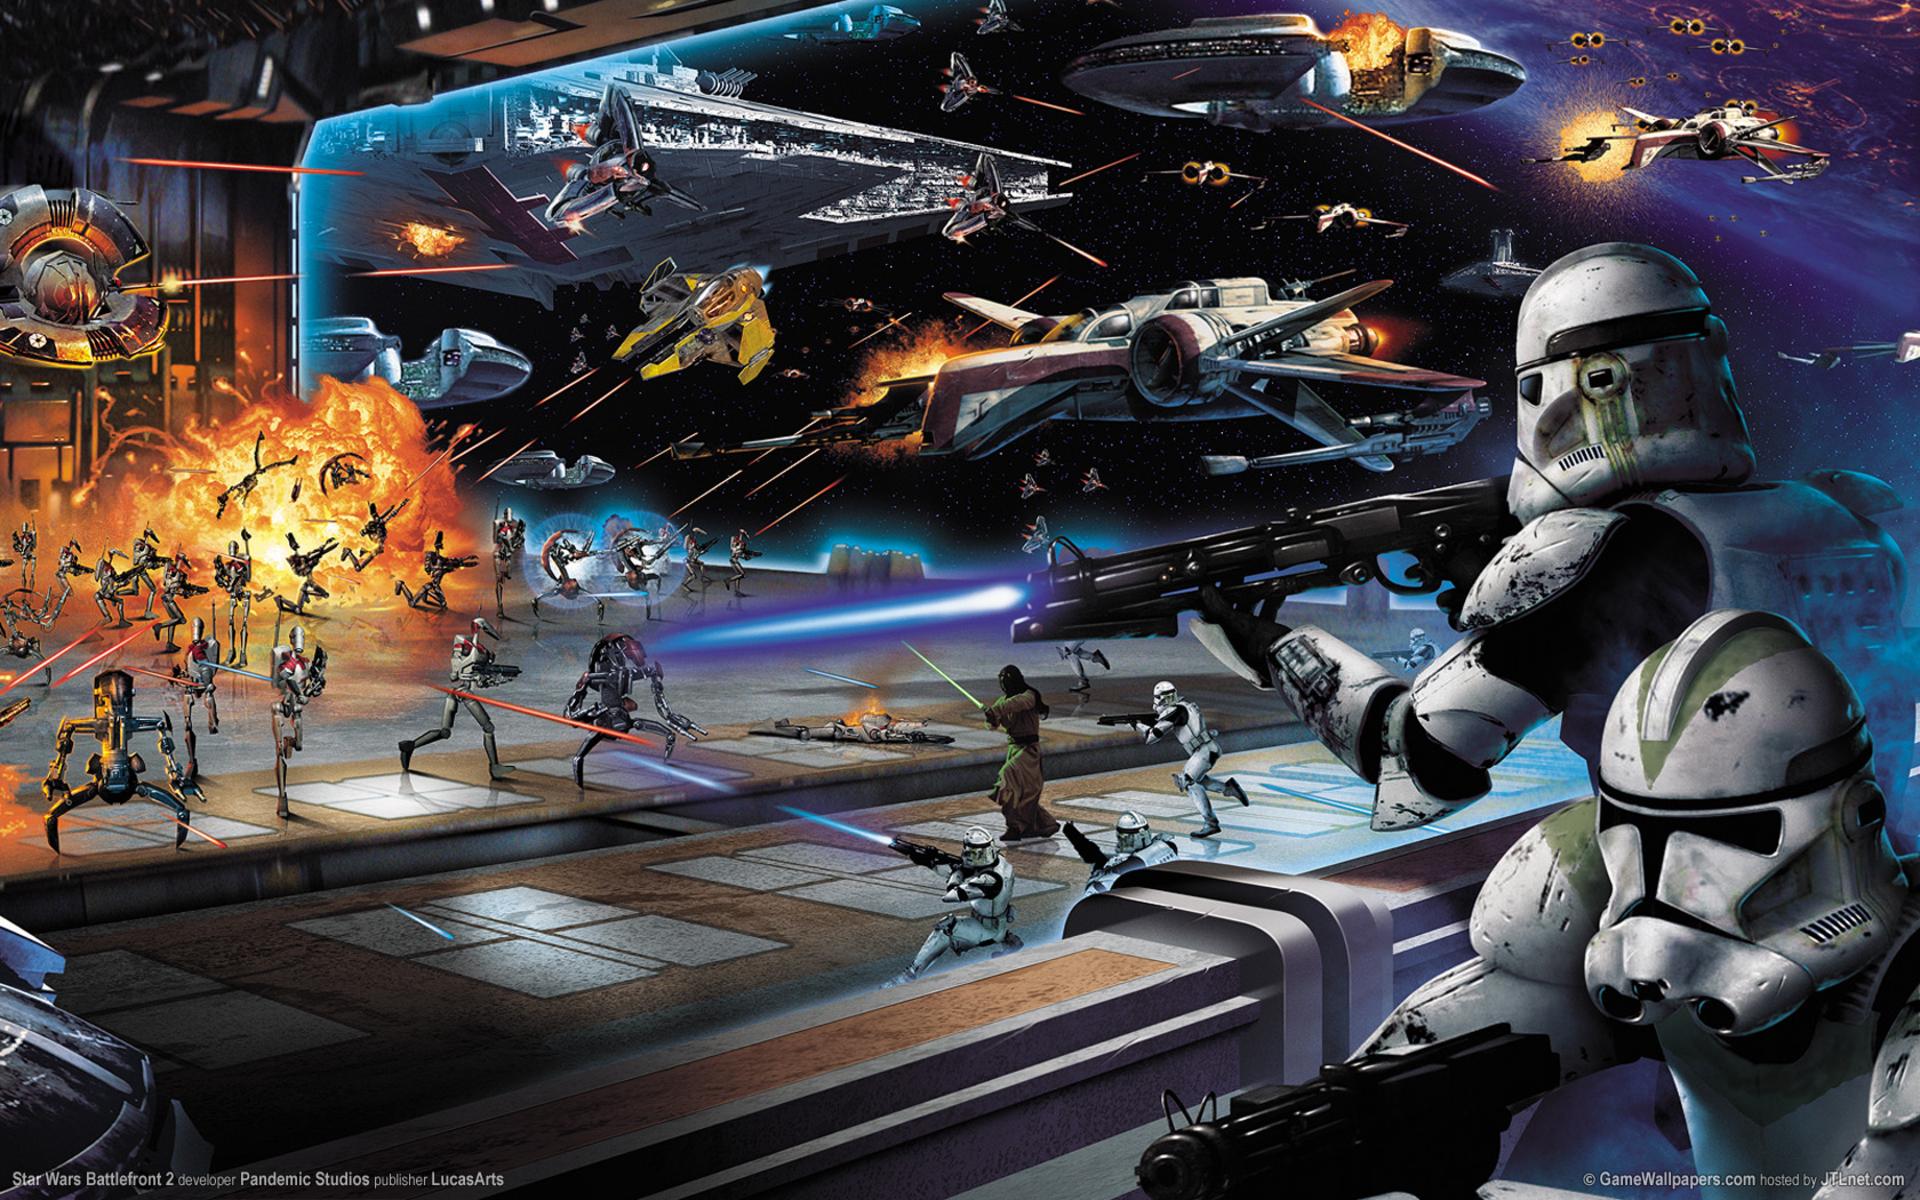 Star Wars Life or Death Battle on a republic cruiser HD Wallpaper 1920x1200